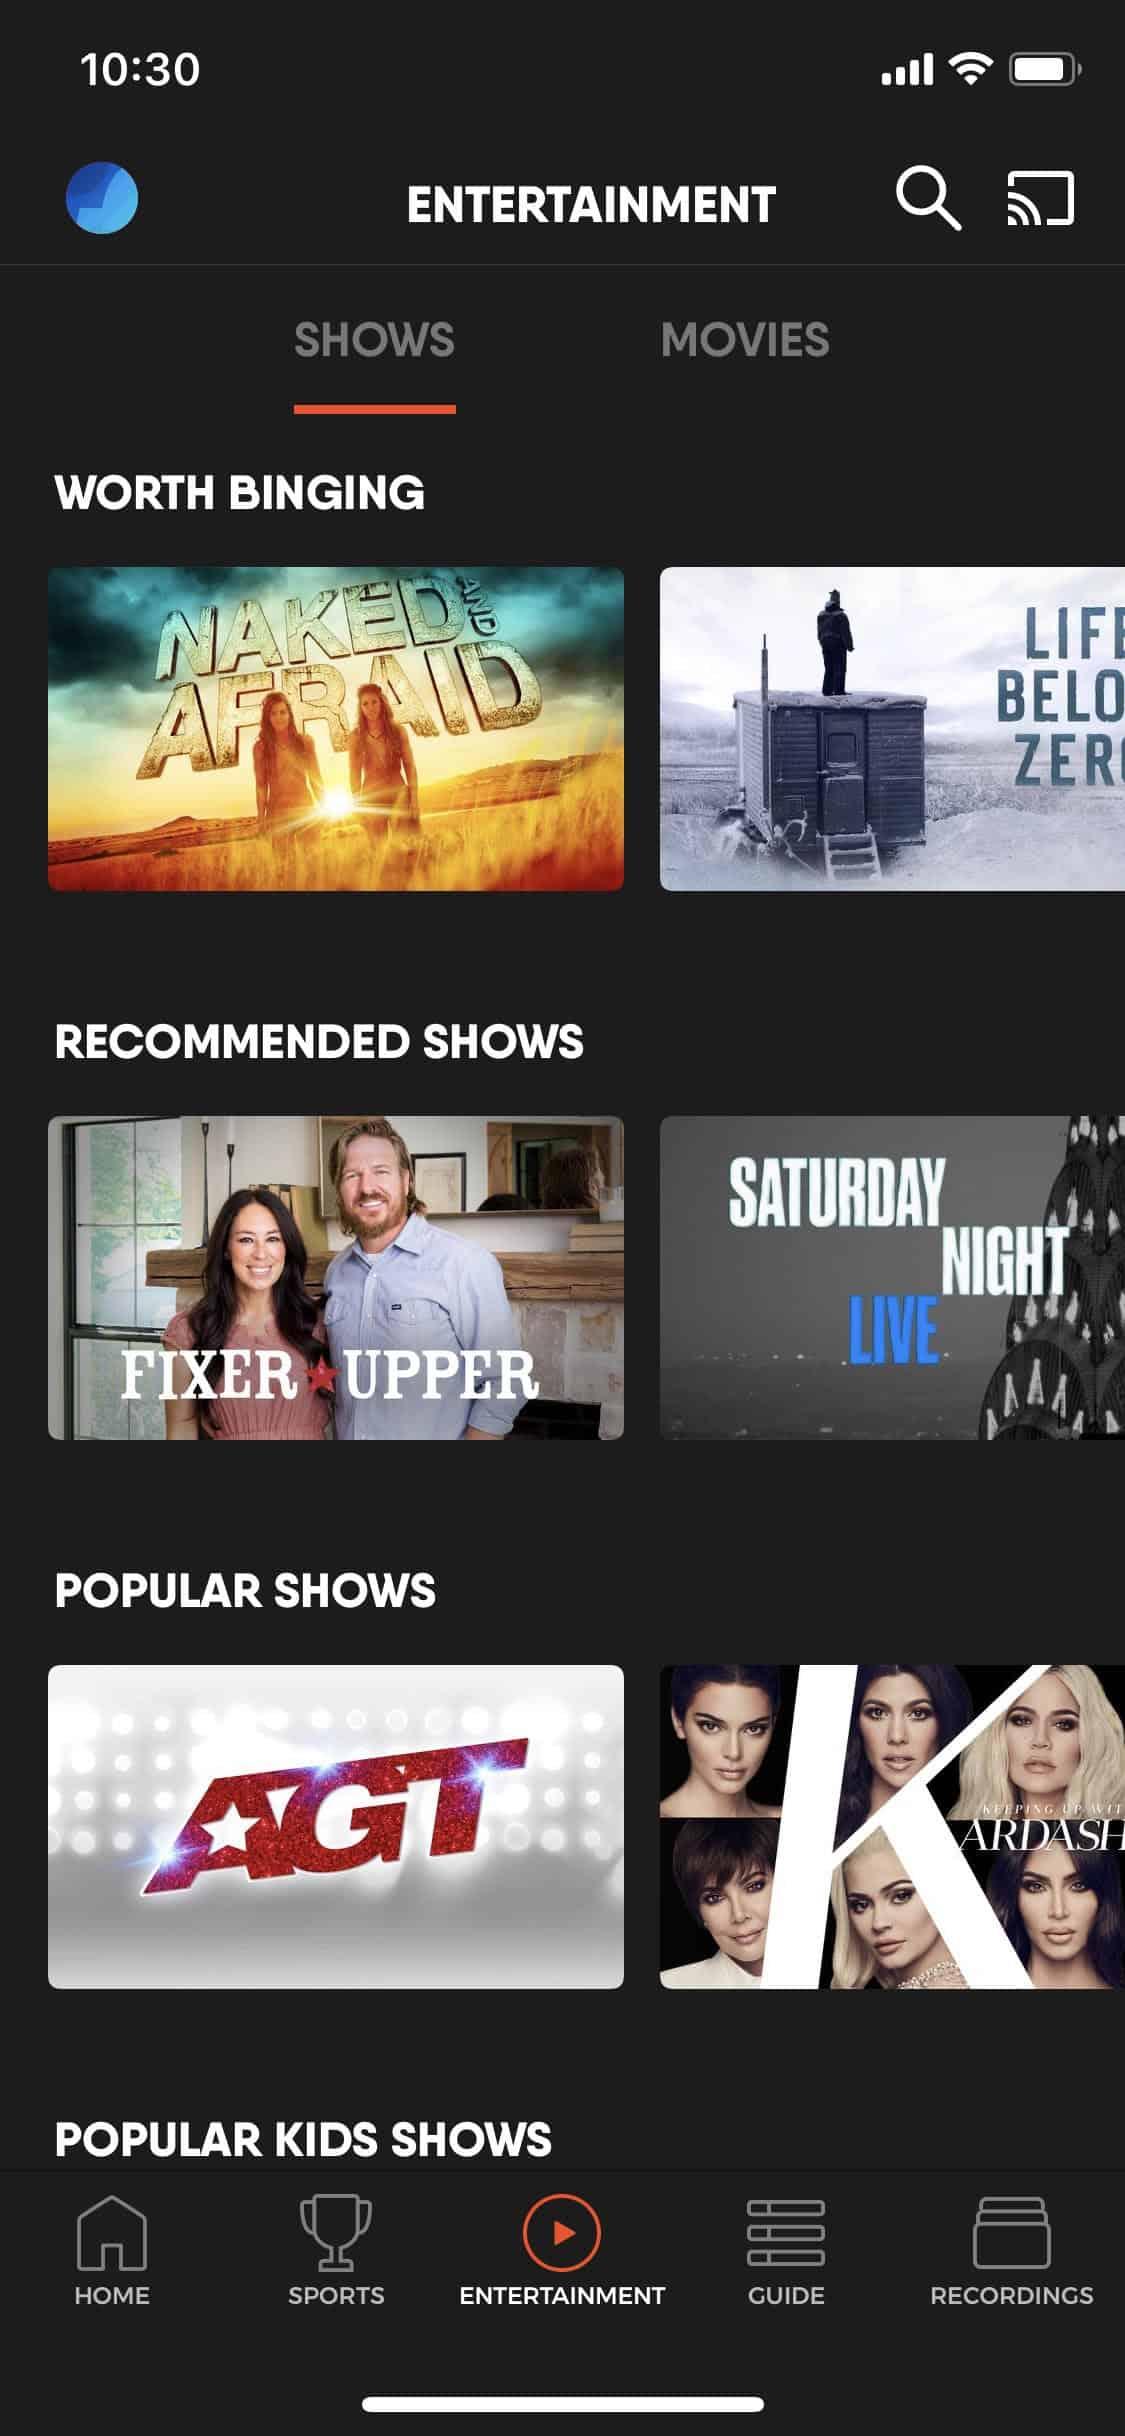 fuboTV - iOS On Demand Menu Shows